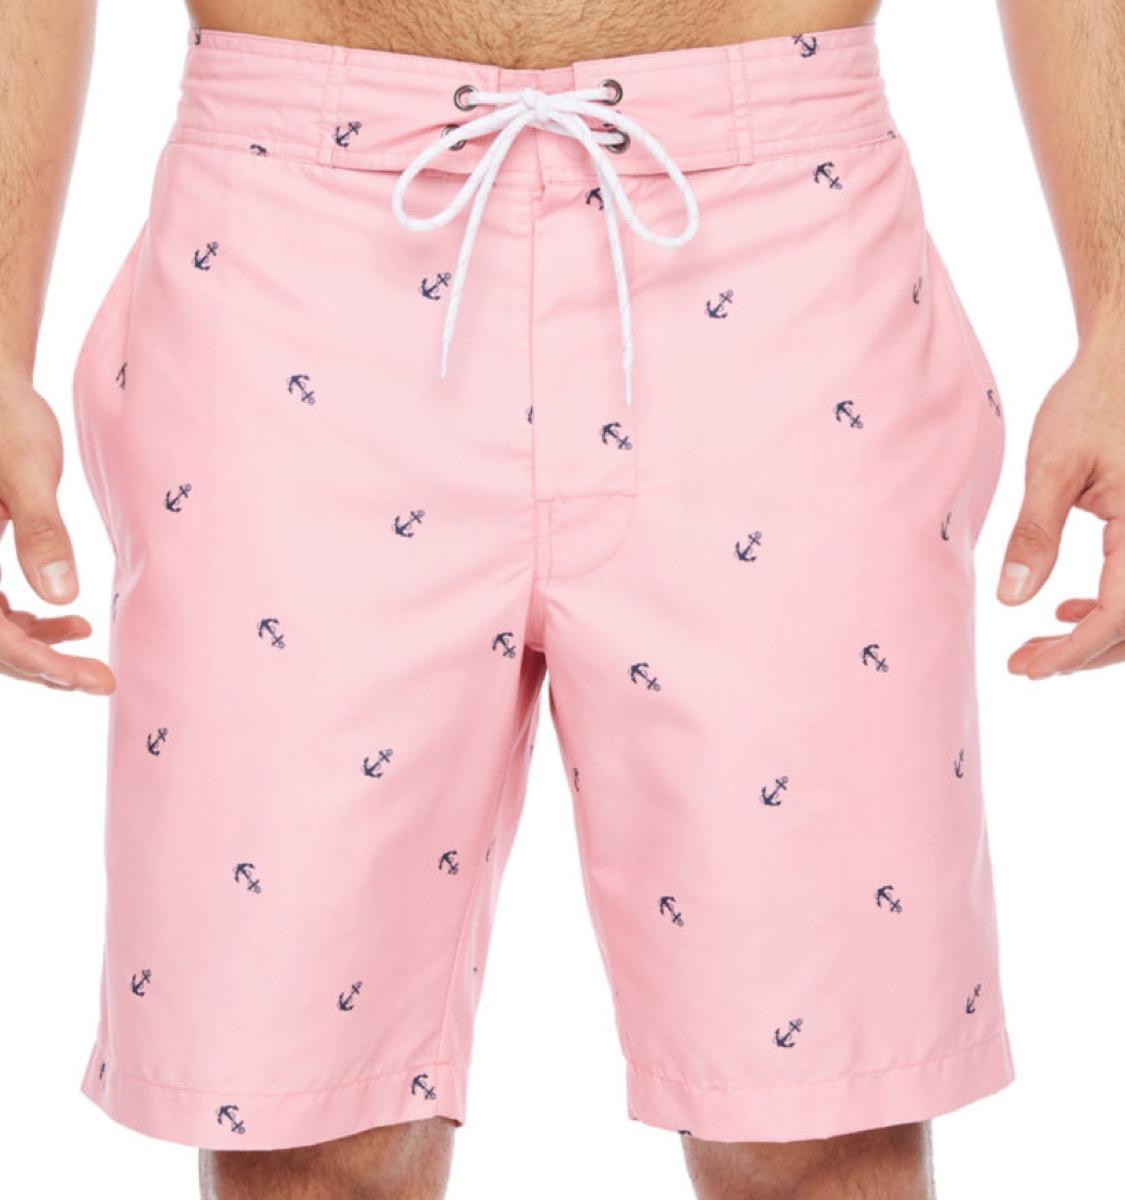 anchor print pink swim trunks, cheap swimsuits